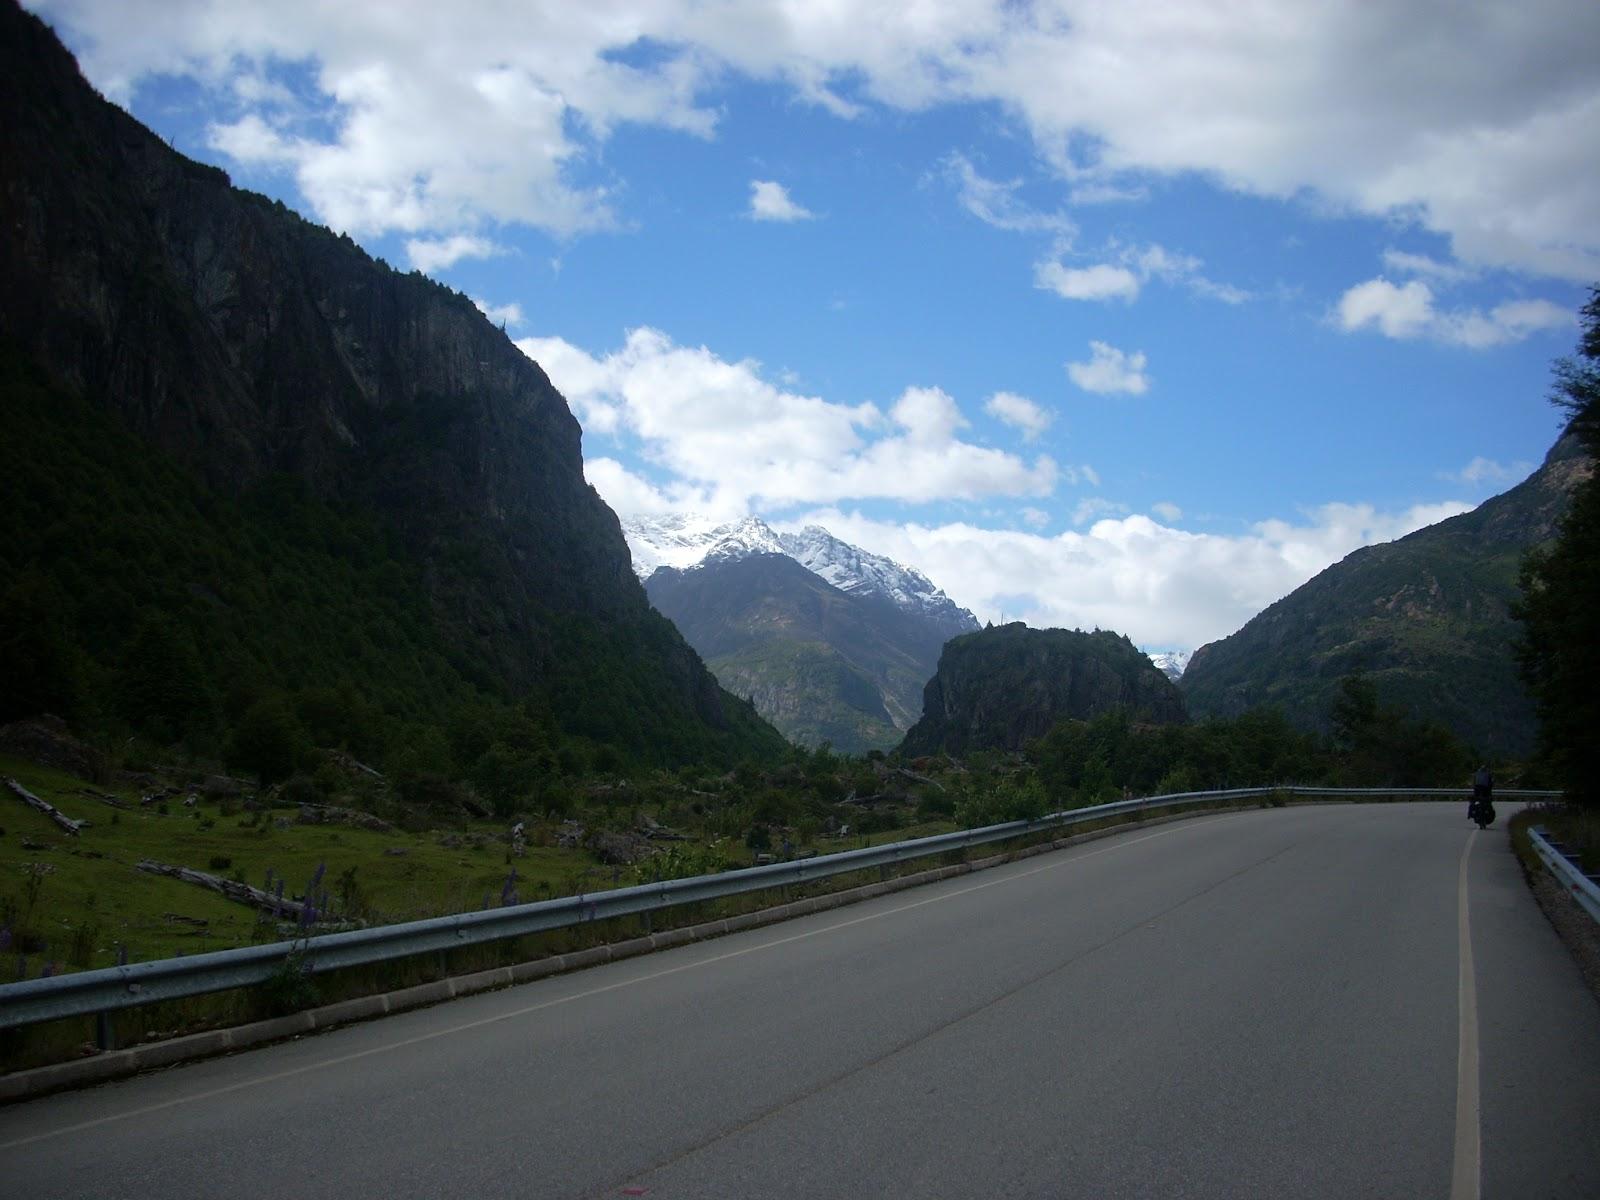 Fine day, smooth roads, such a change